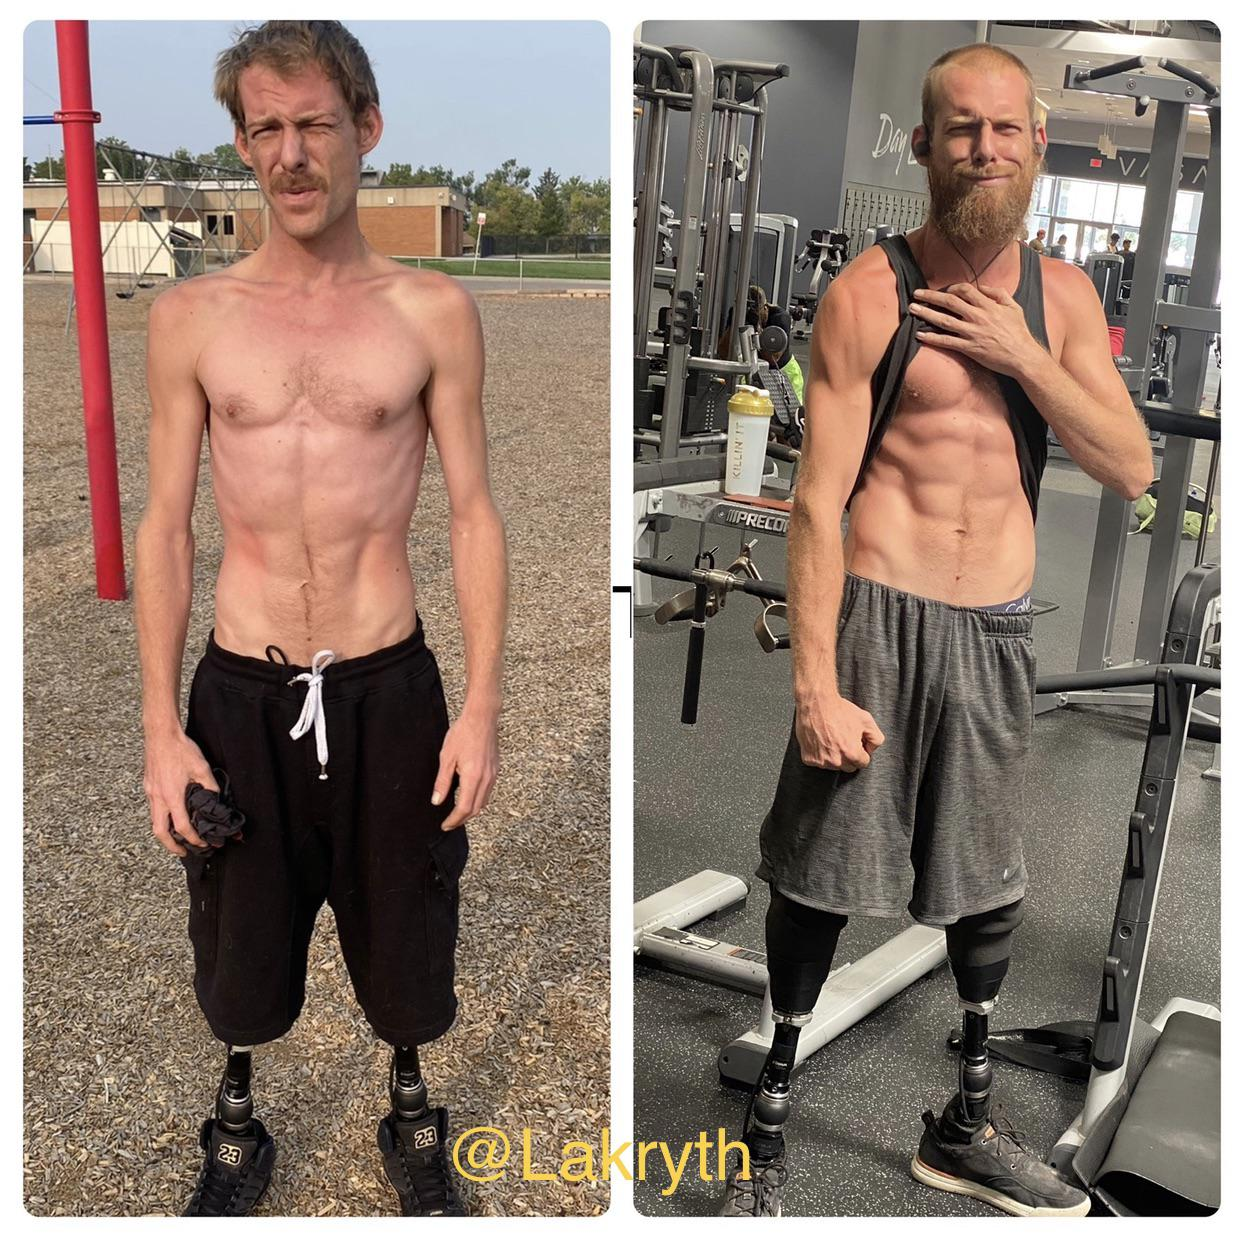 6 feet 2 Male 40 lbs Weight Gain 100 lbs to 140 lbs